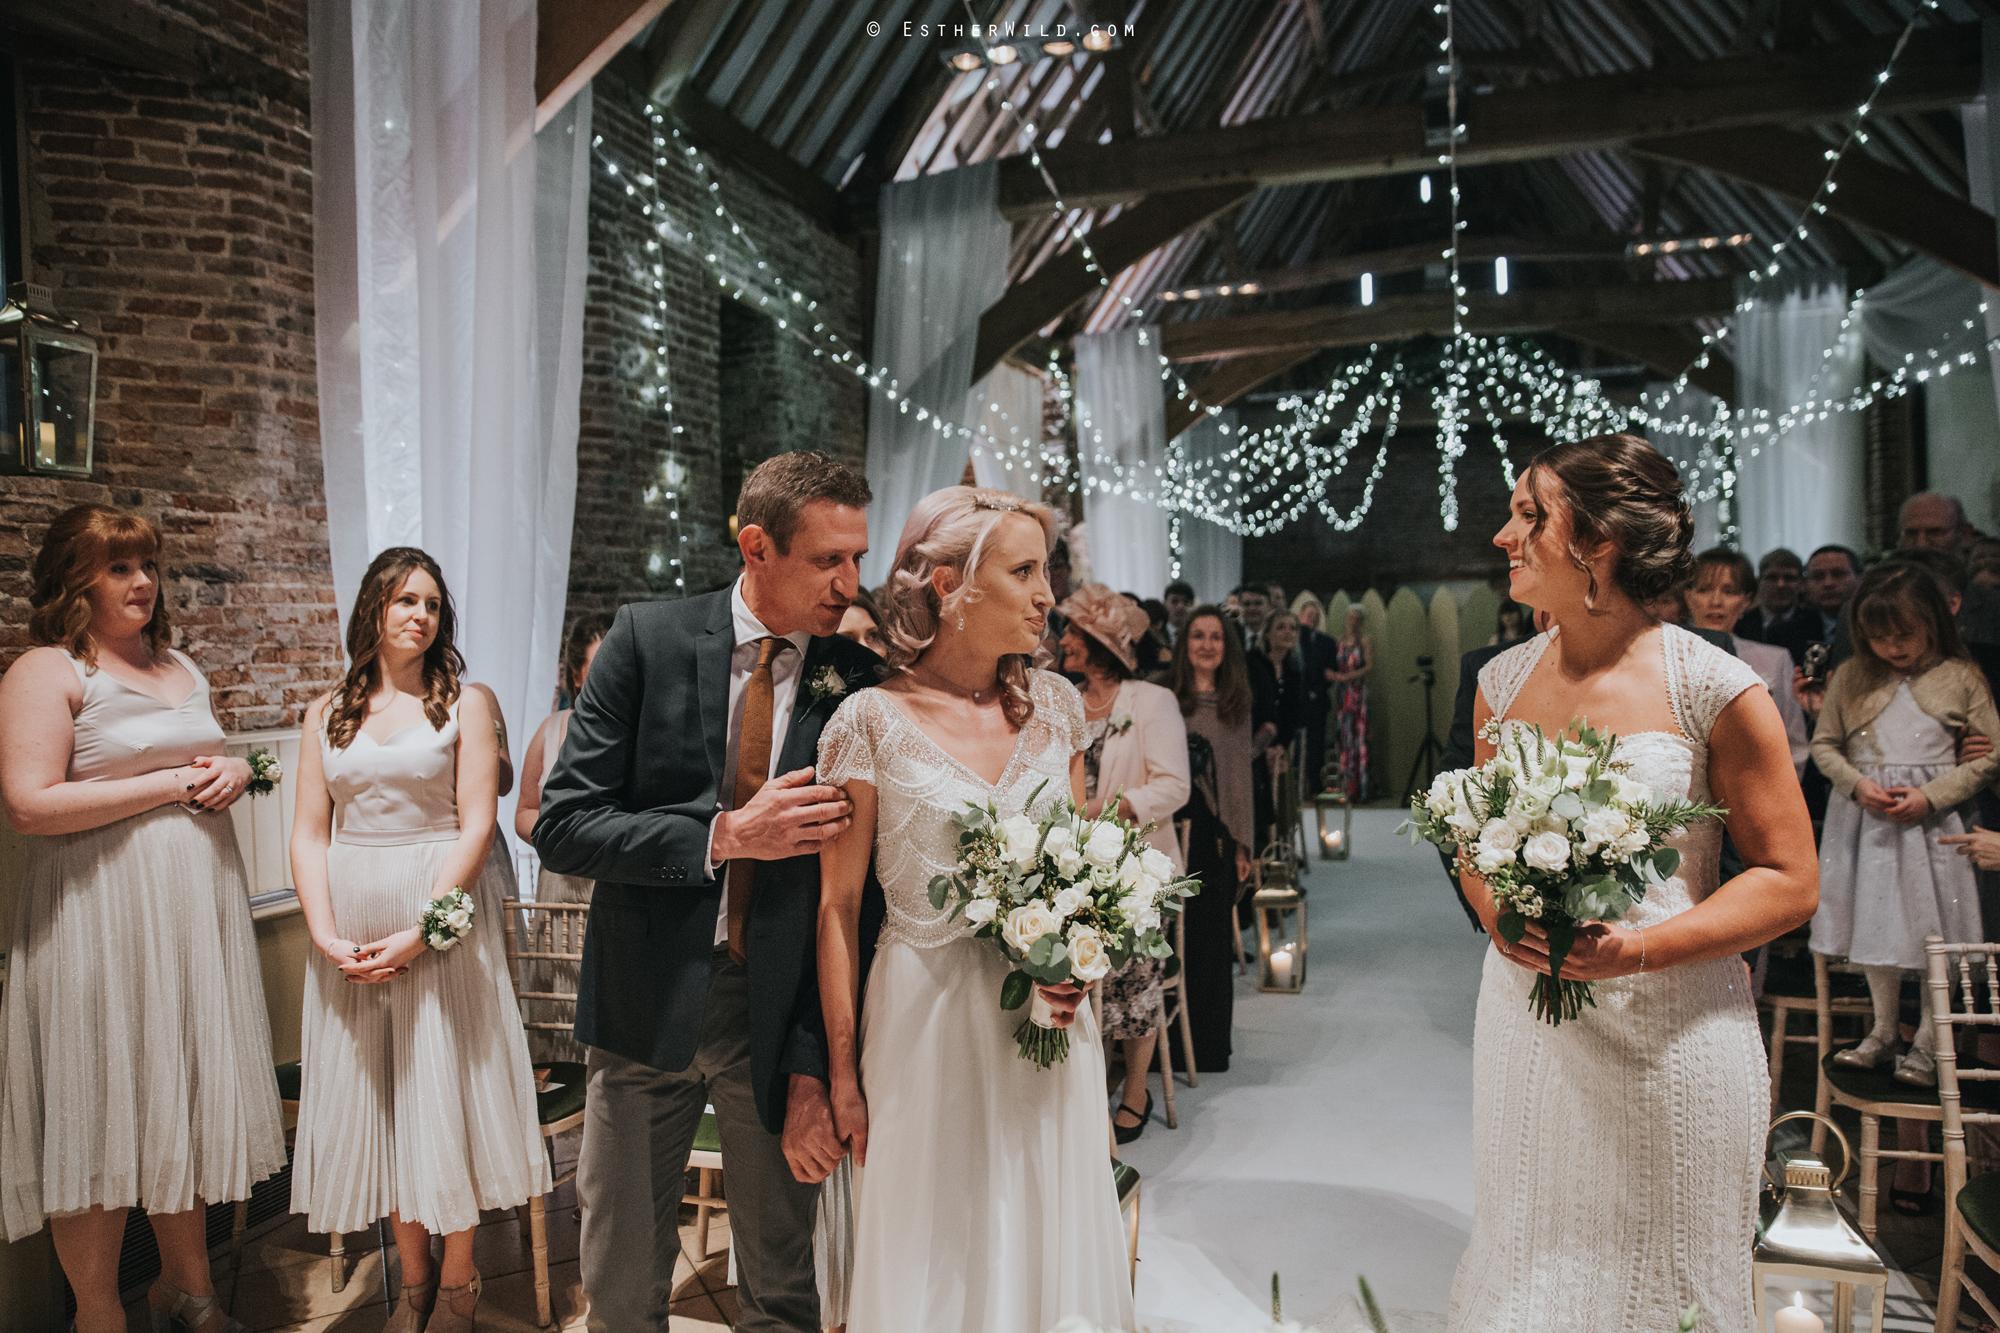 Elms_Barn_Weddings_Suffolk_Photographer_Copyright_Esther_Wild_IMG_1144.jpg